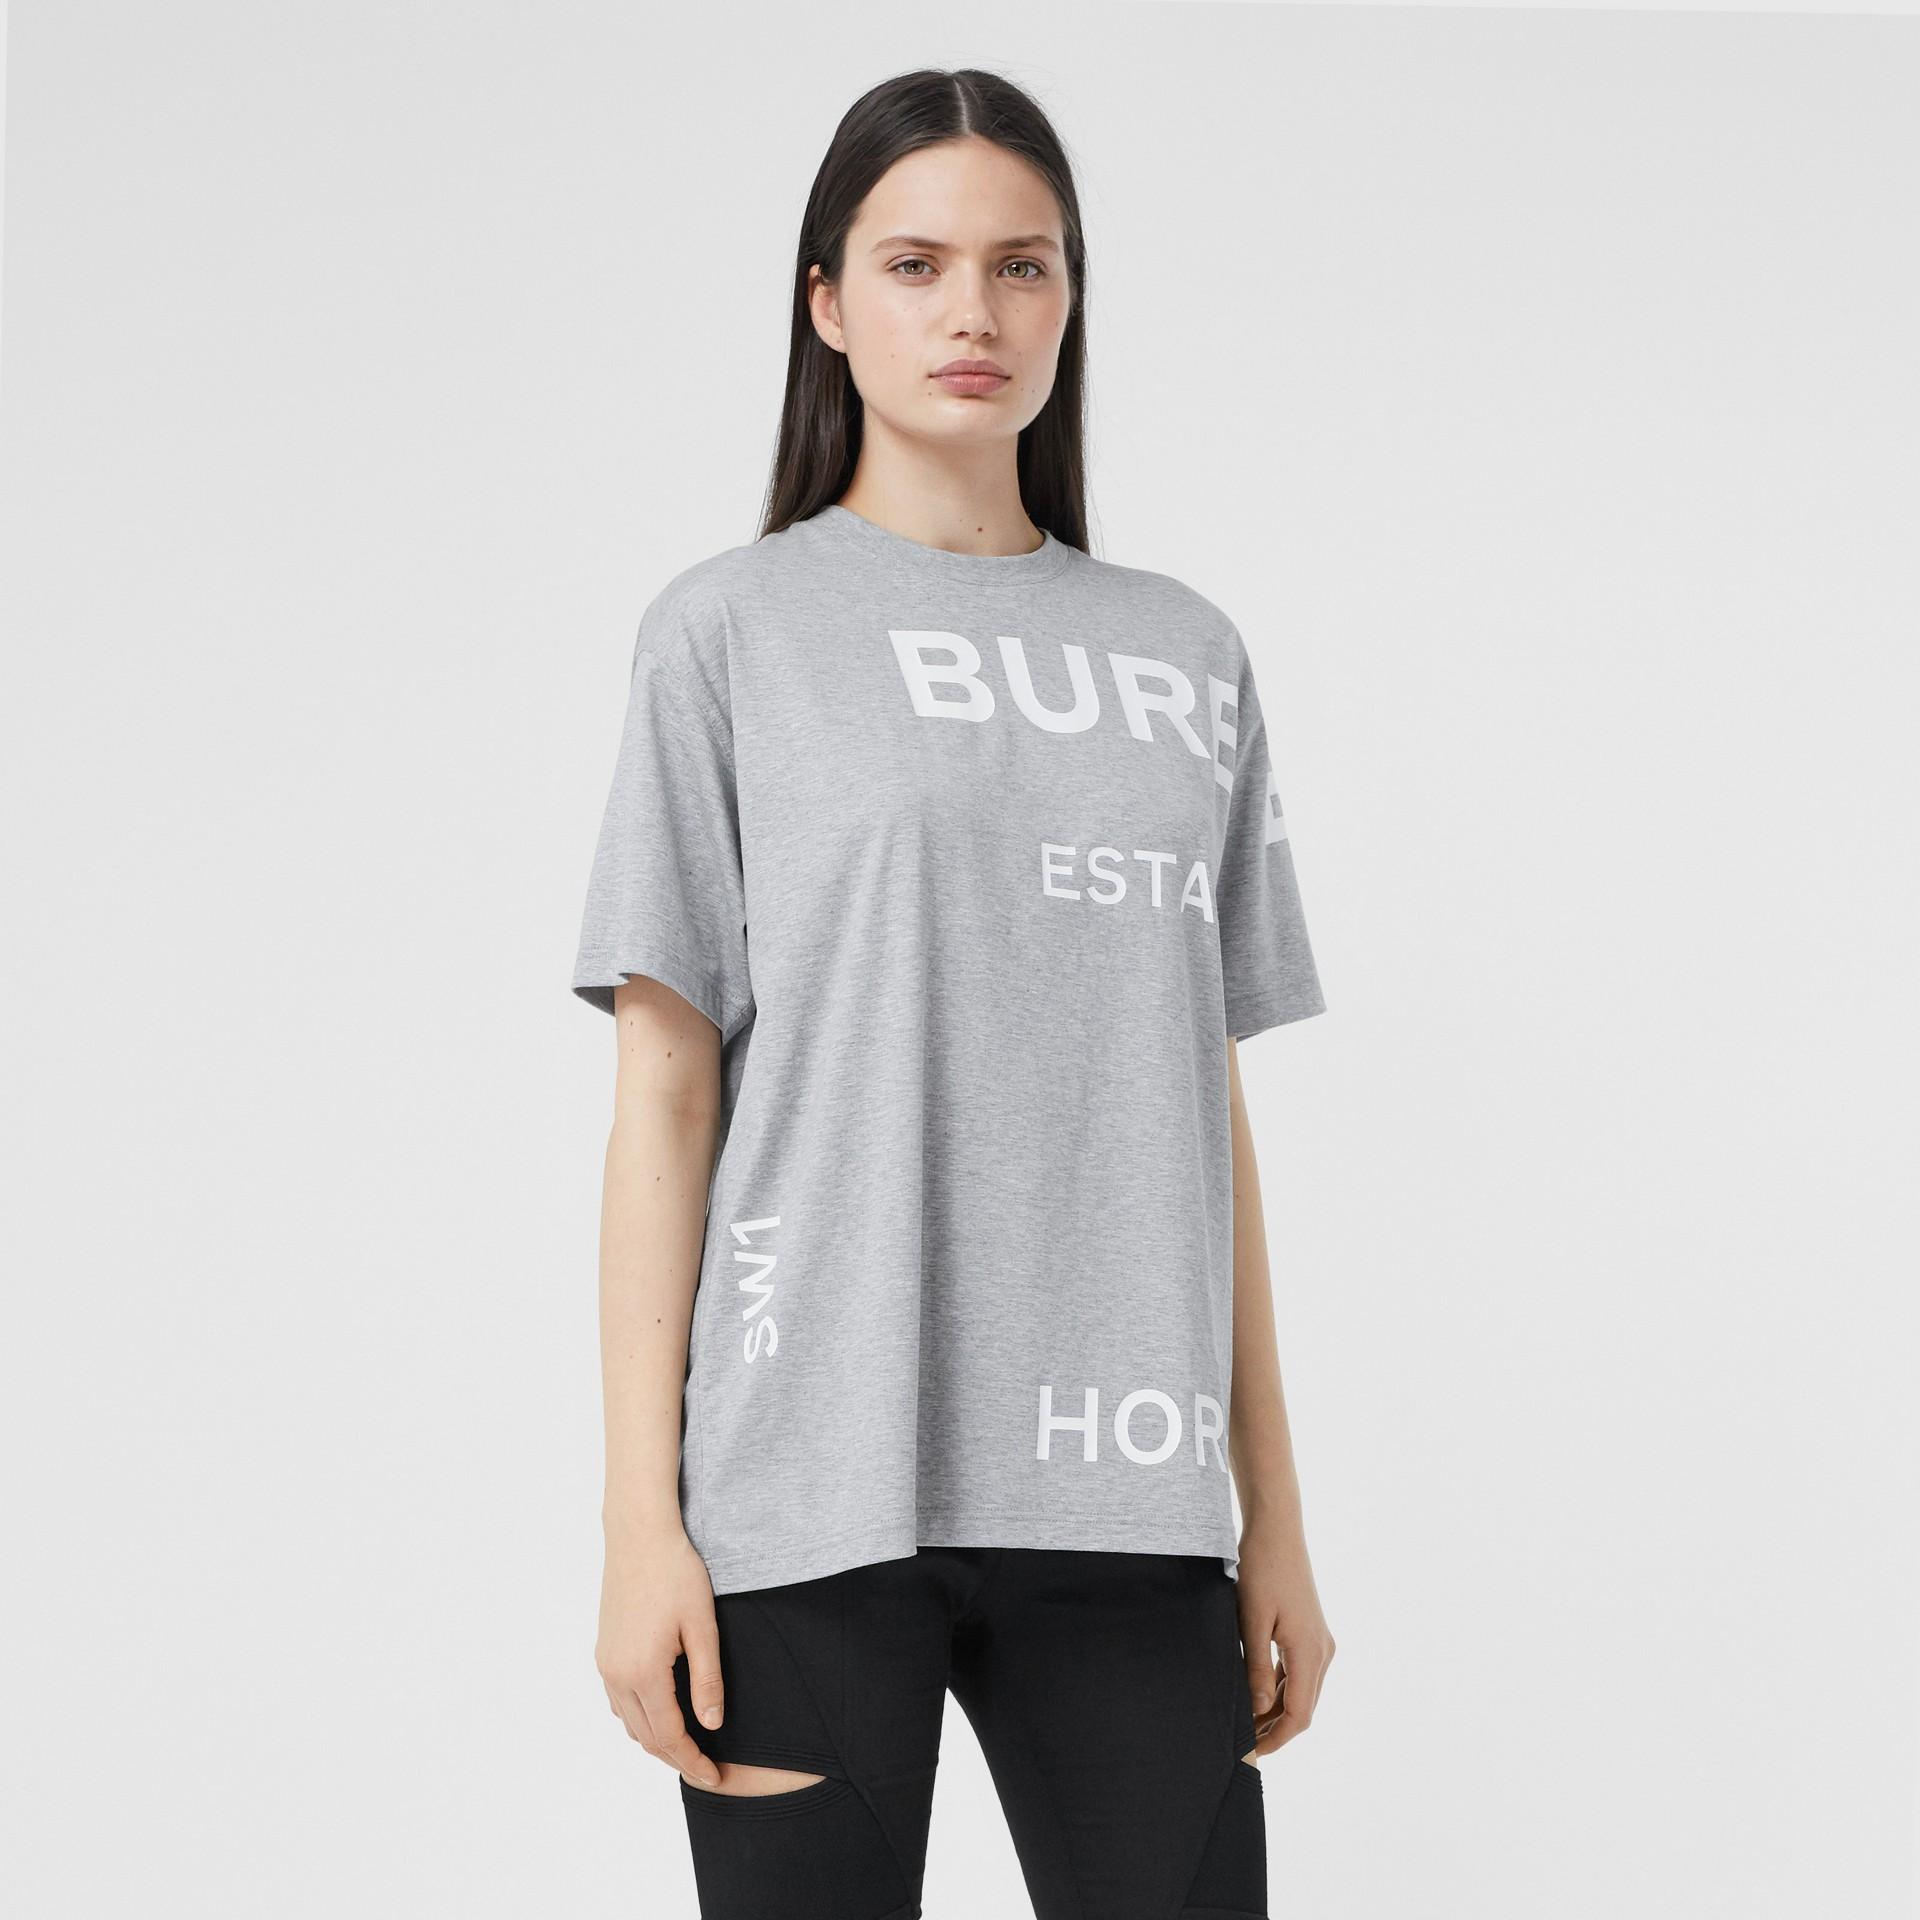 Horseferry 印花棉質寬版 T 恤 (淡混合灰) - 女款 | Burberry - 圖庫照片 4